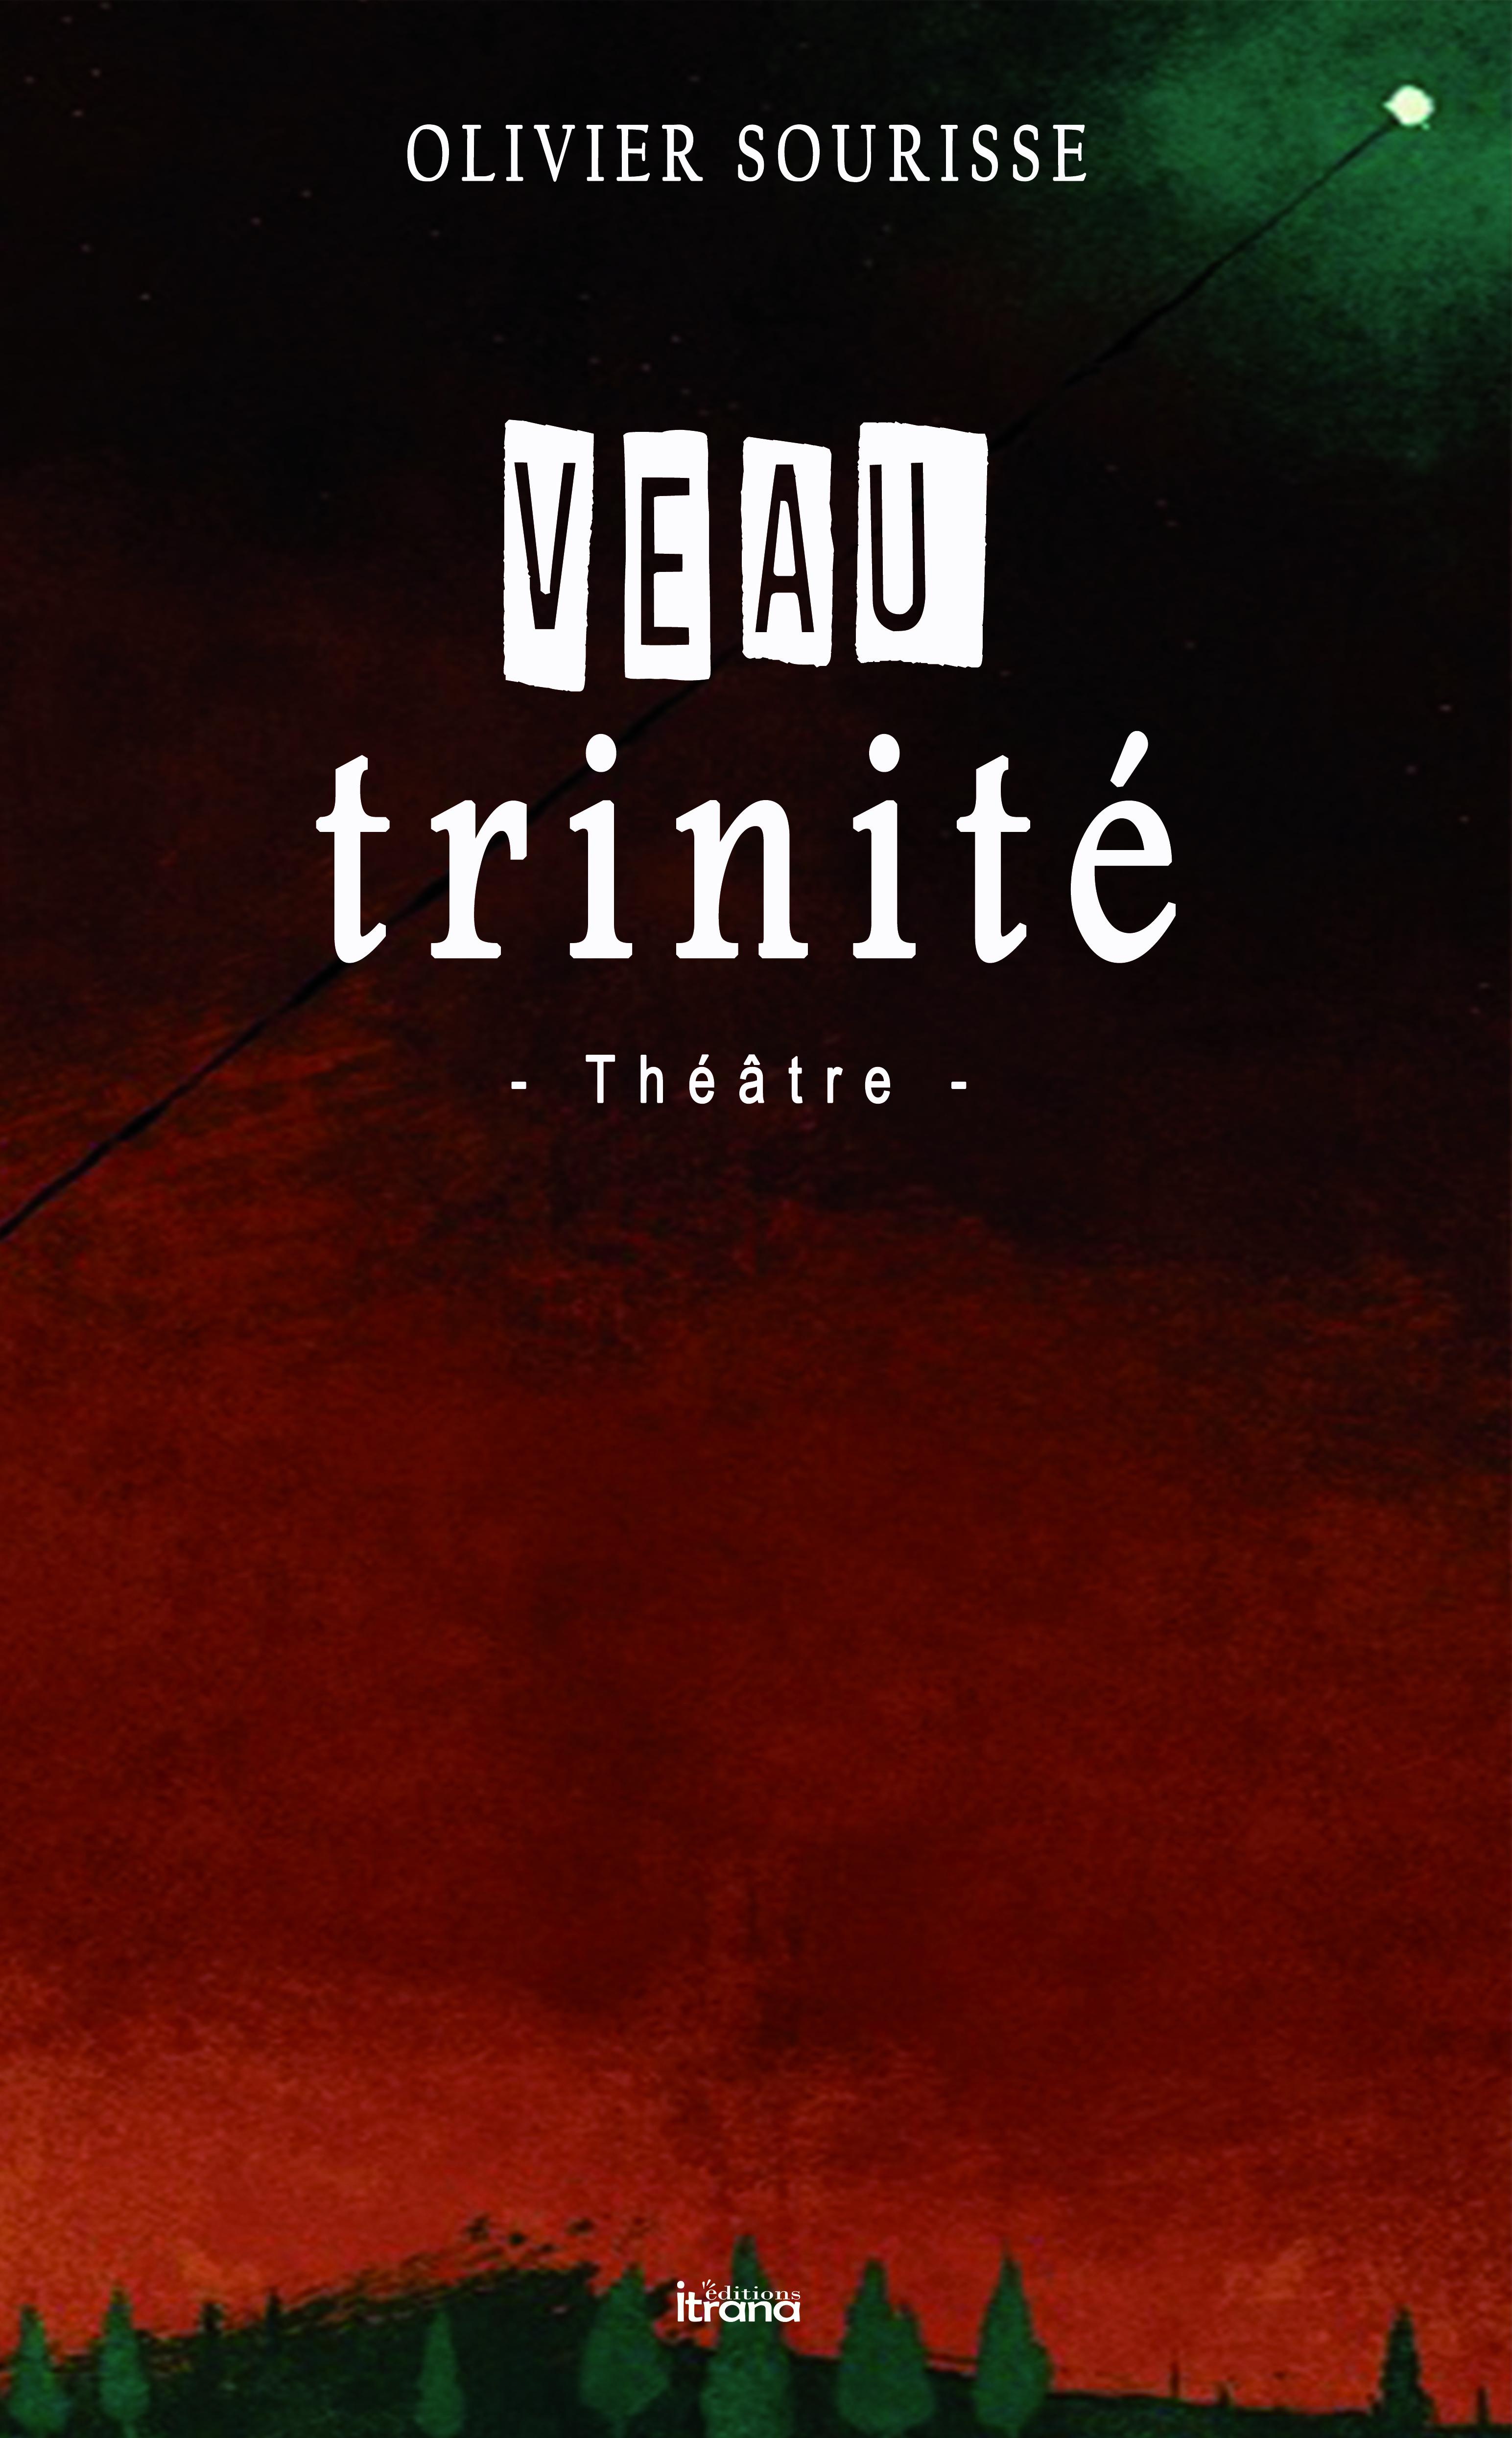 VEAU TRINITE